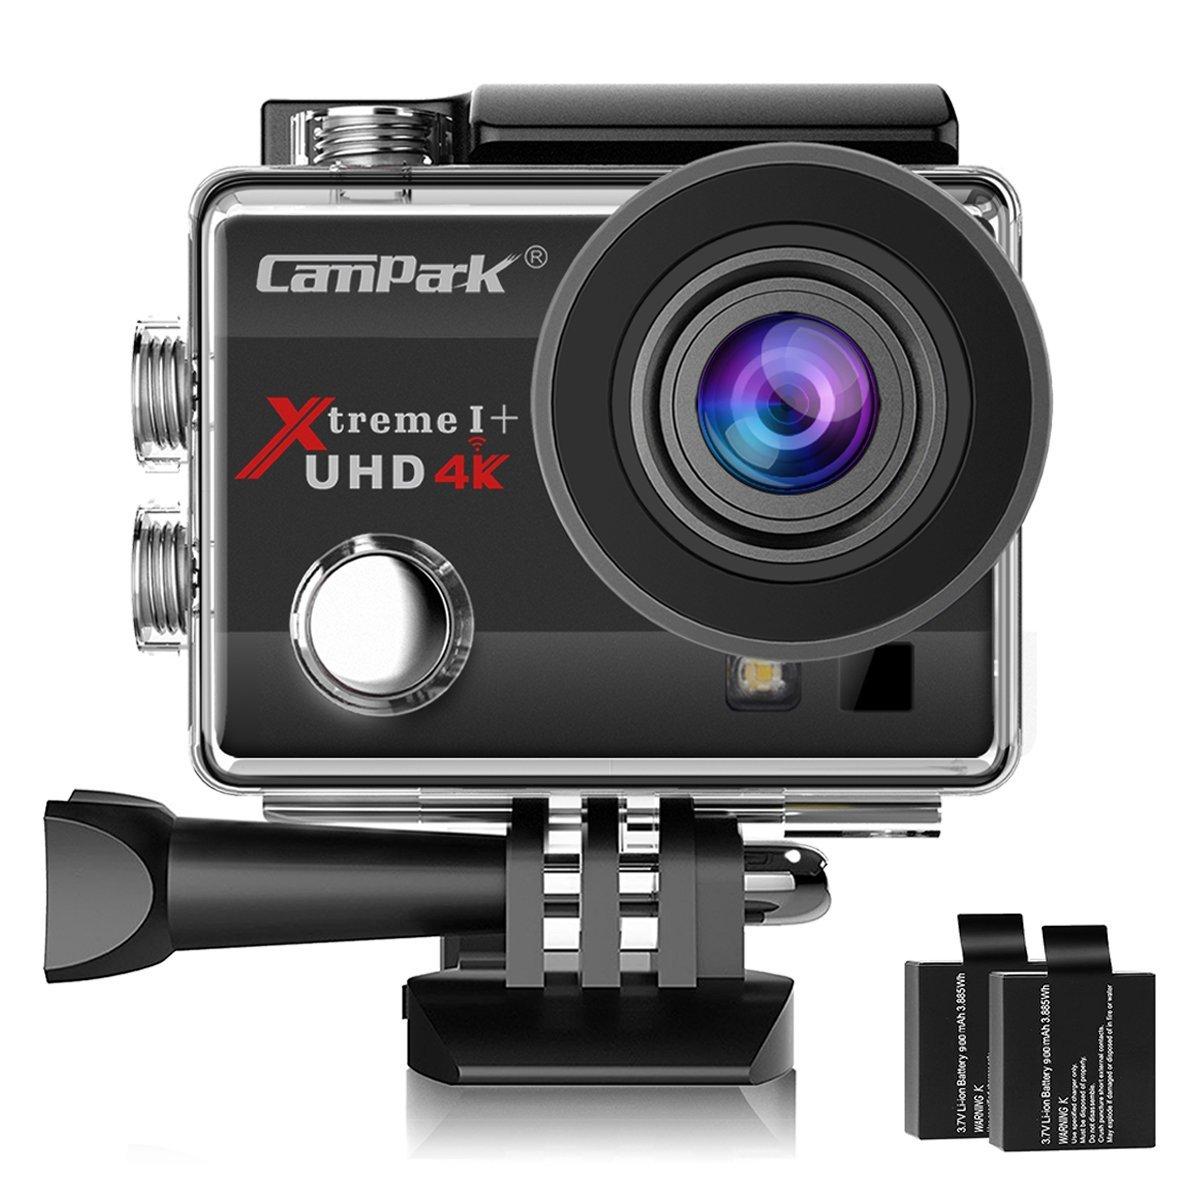 Timelapse camera